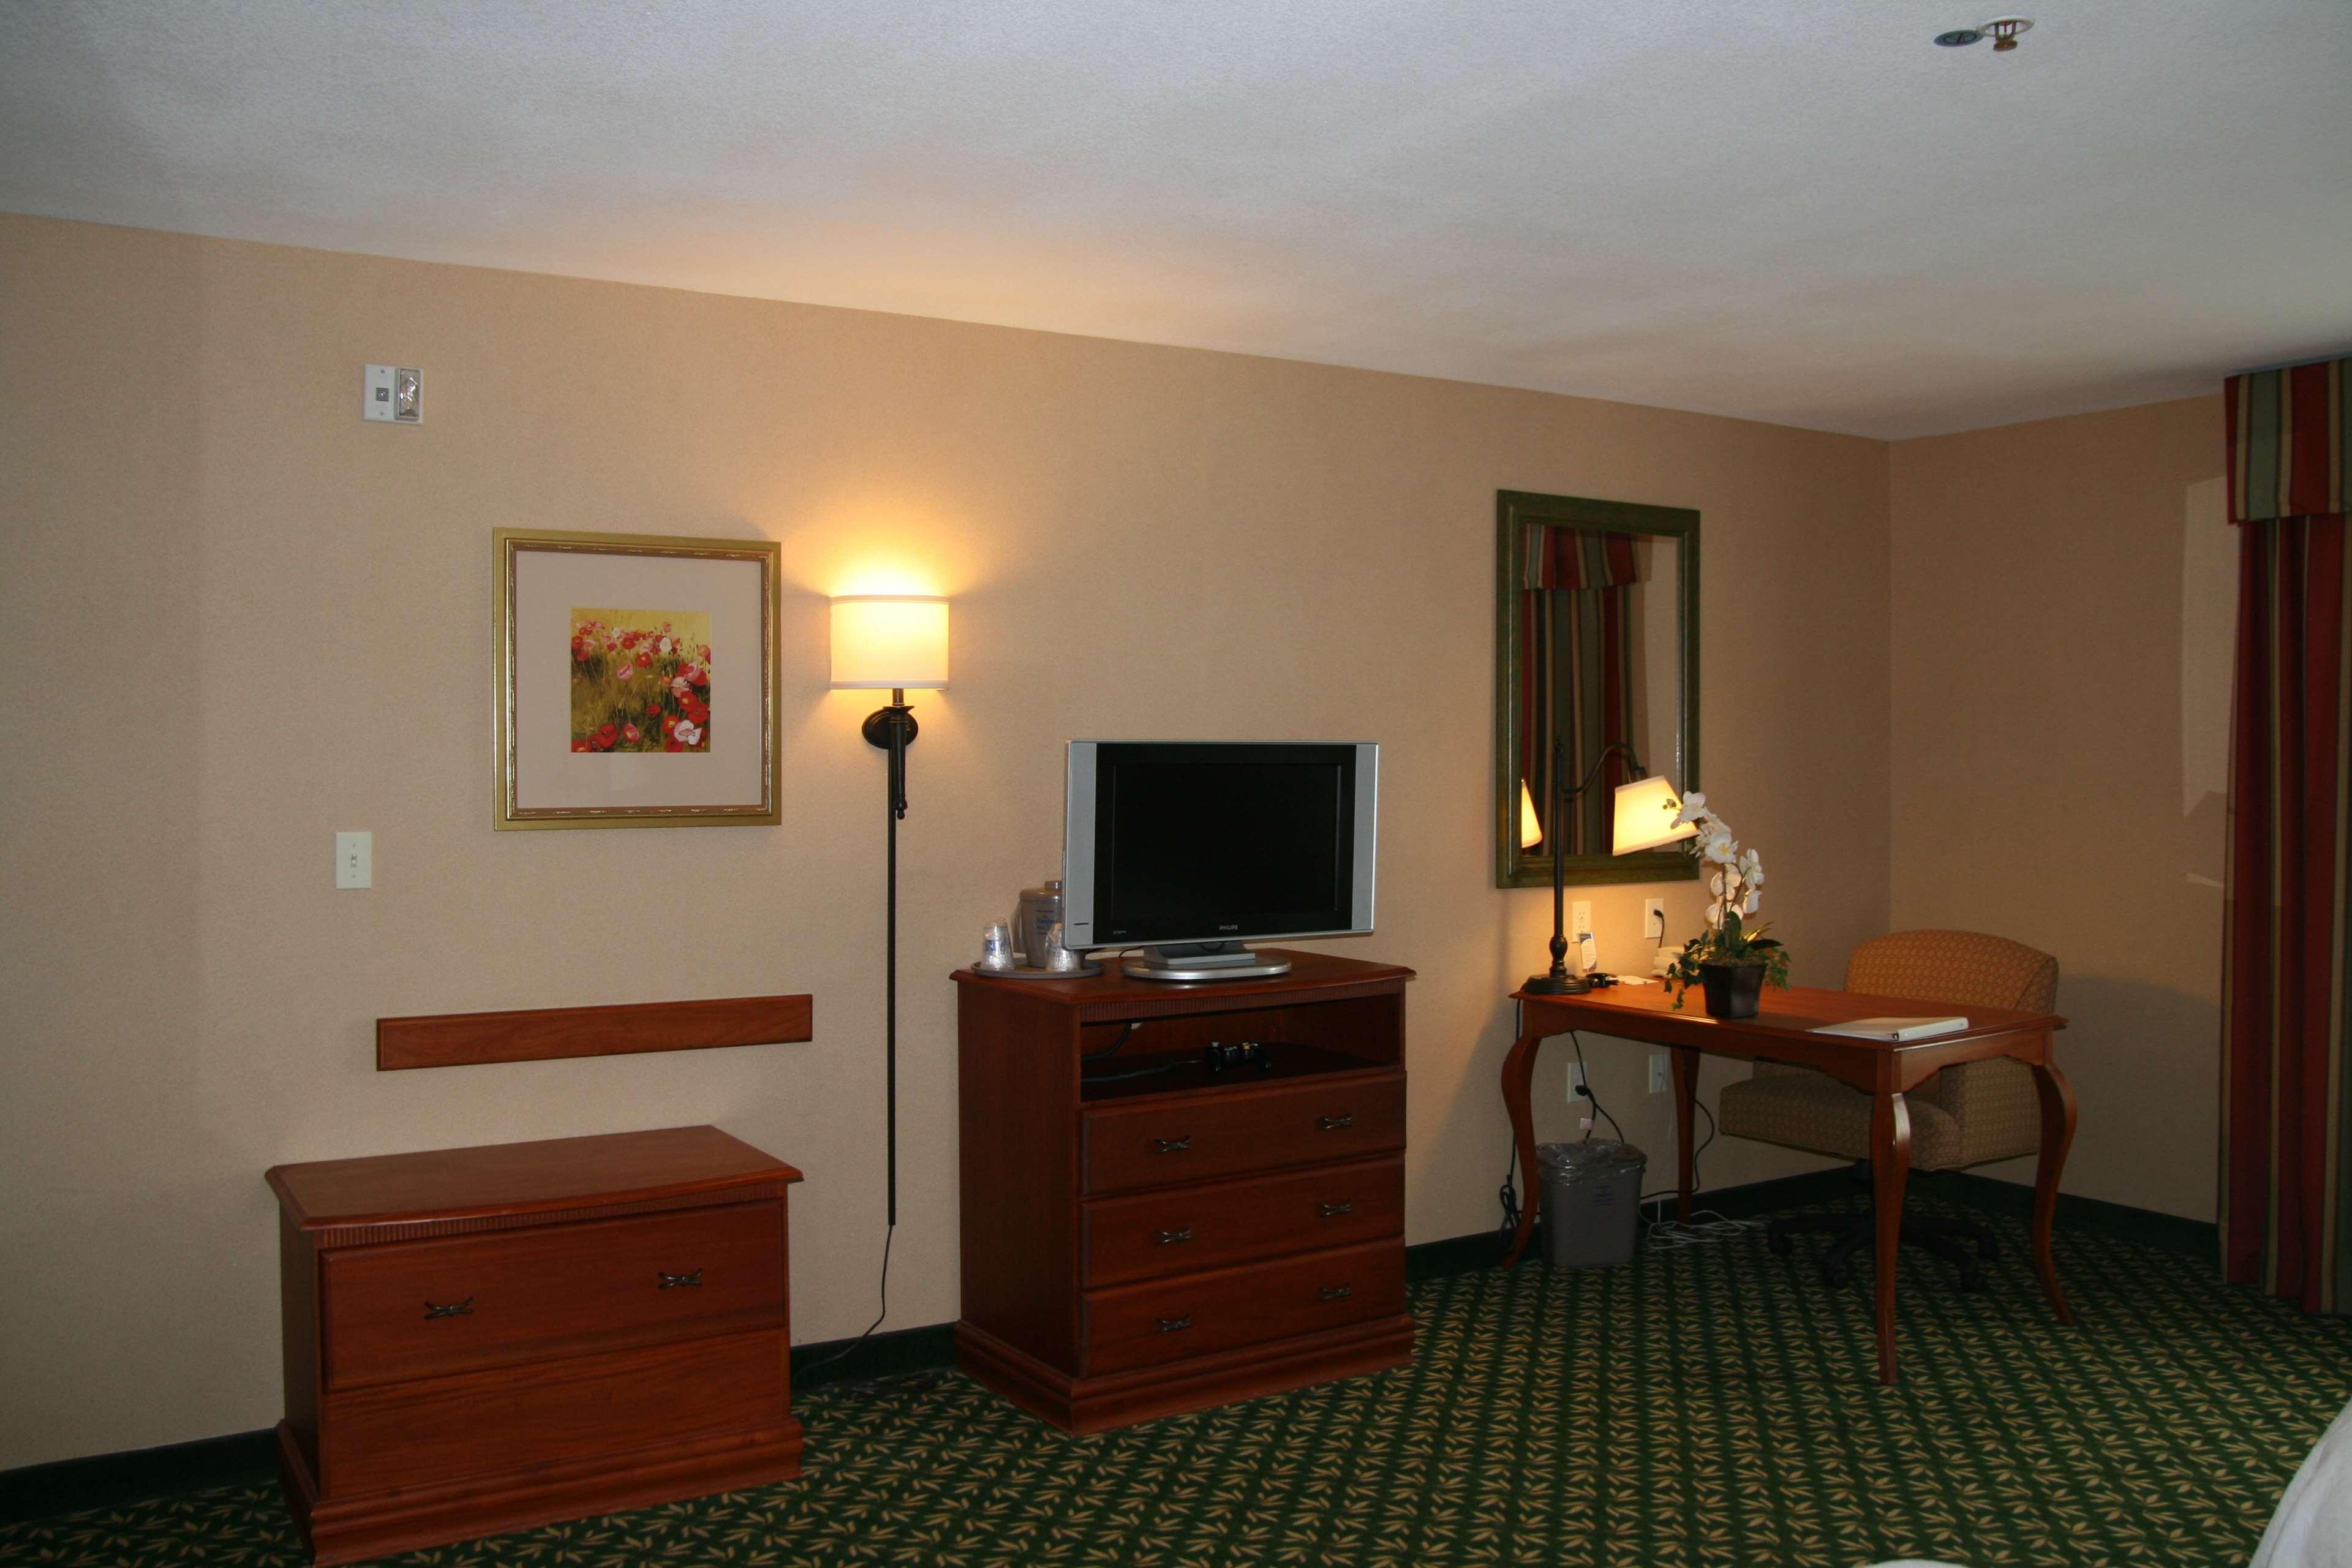 Hampton Inn & Suites Rohnert Park - Sonoma County image 10